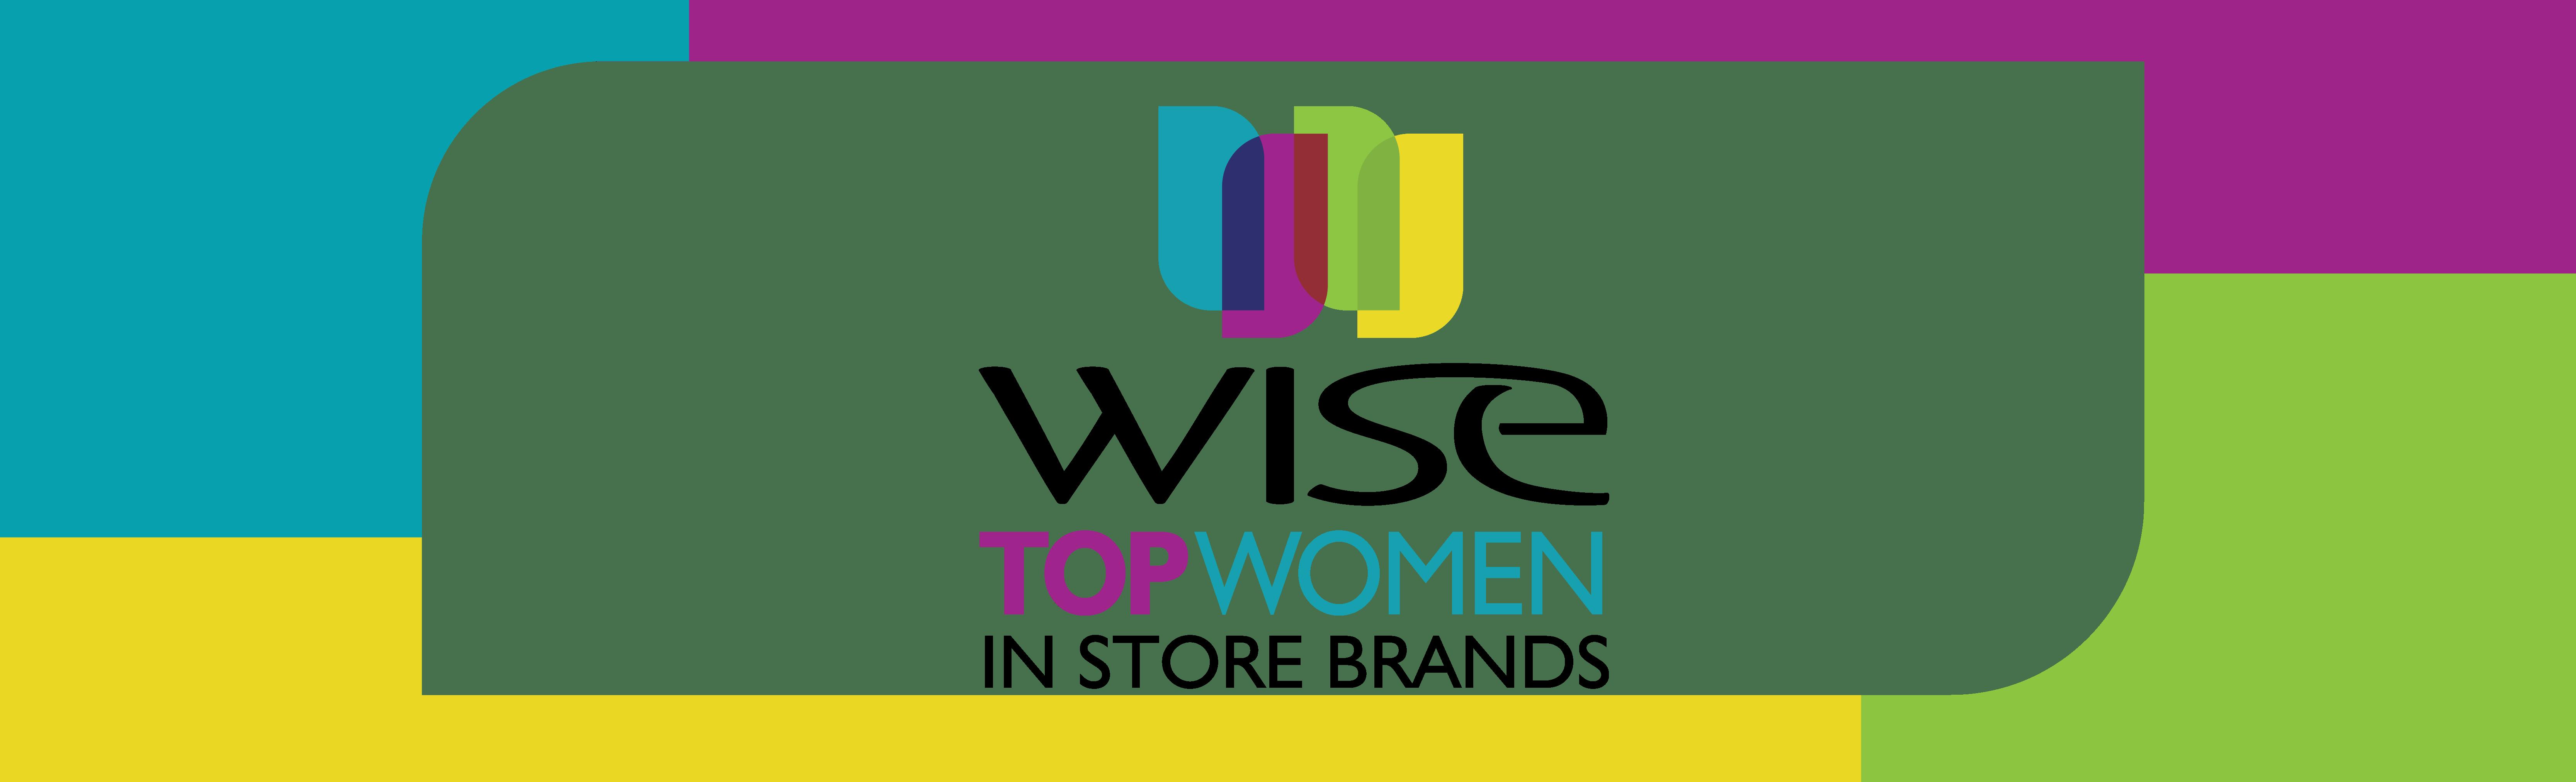 2021 WISE Web Headers TOP WOMEN